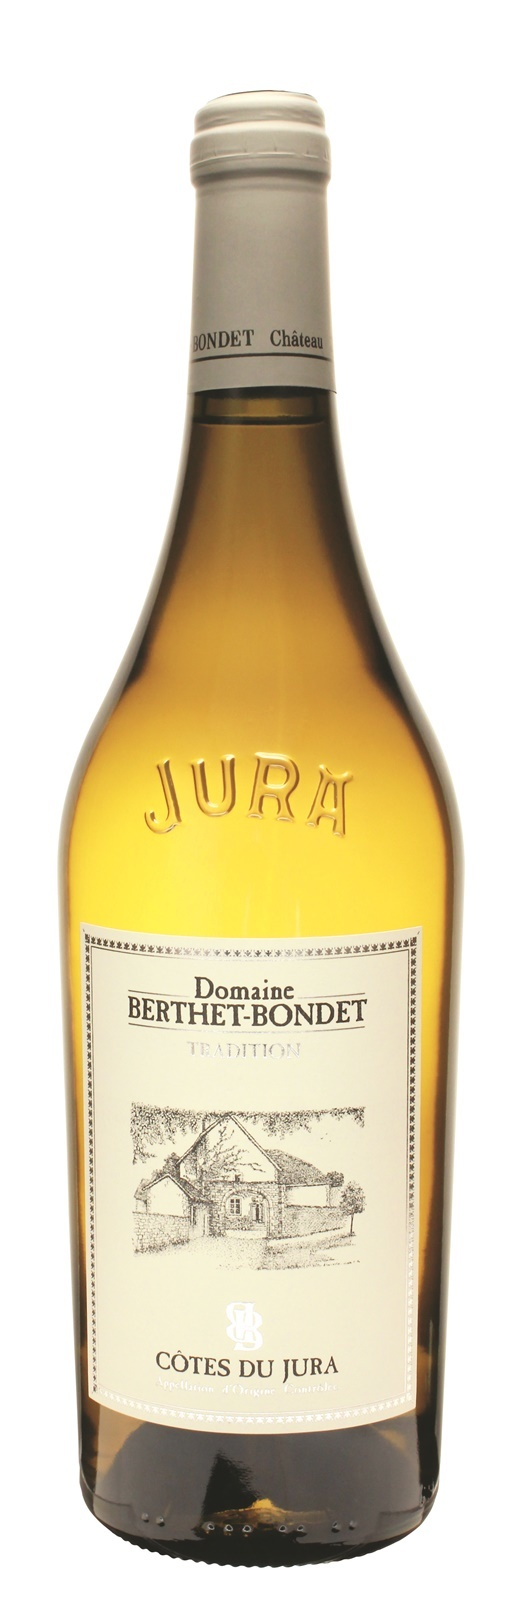 Berthet-Bondet - Jura 2016 Cotes du Jura Tradition, Domaine Berthet-Bondet